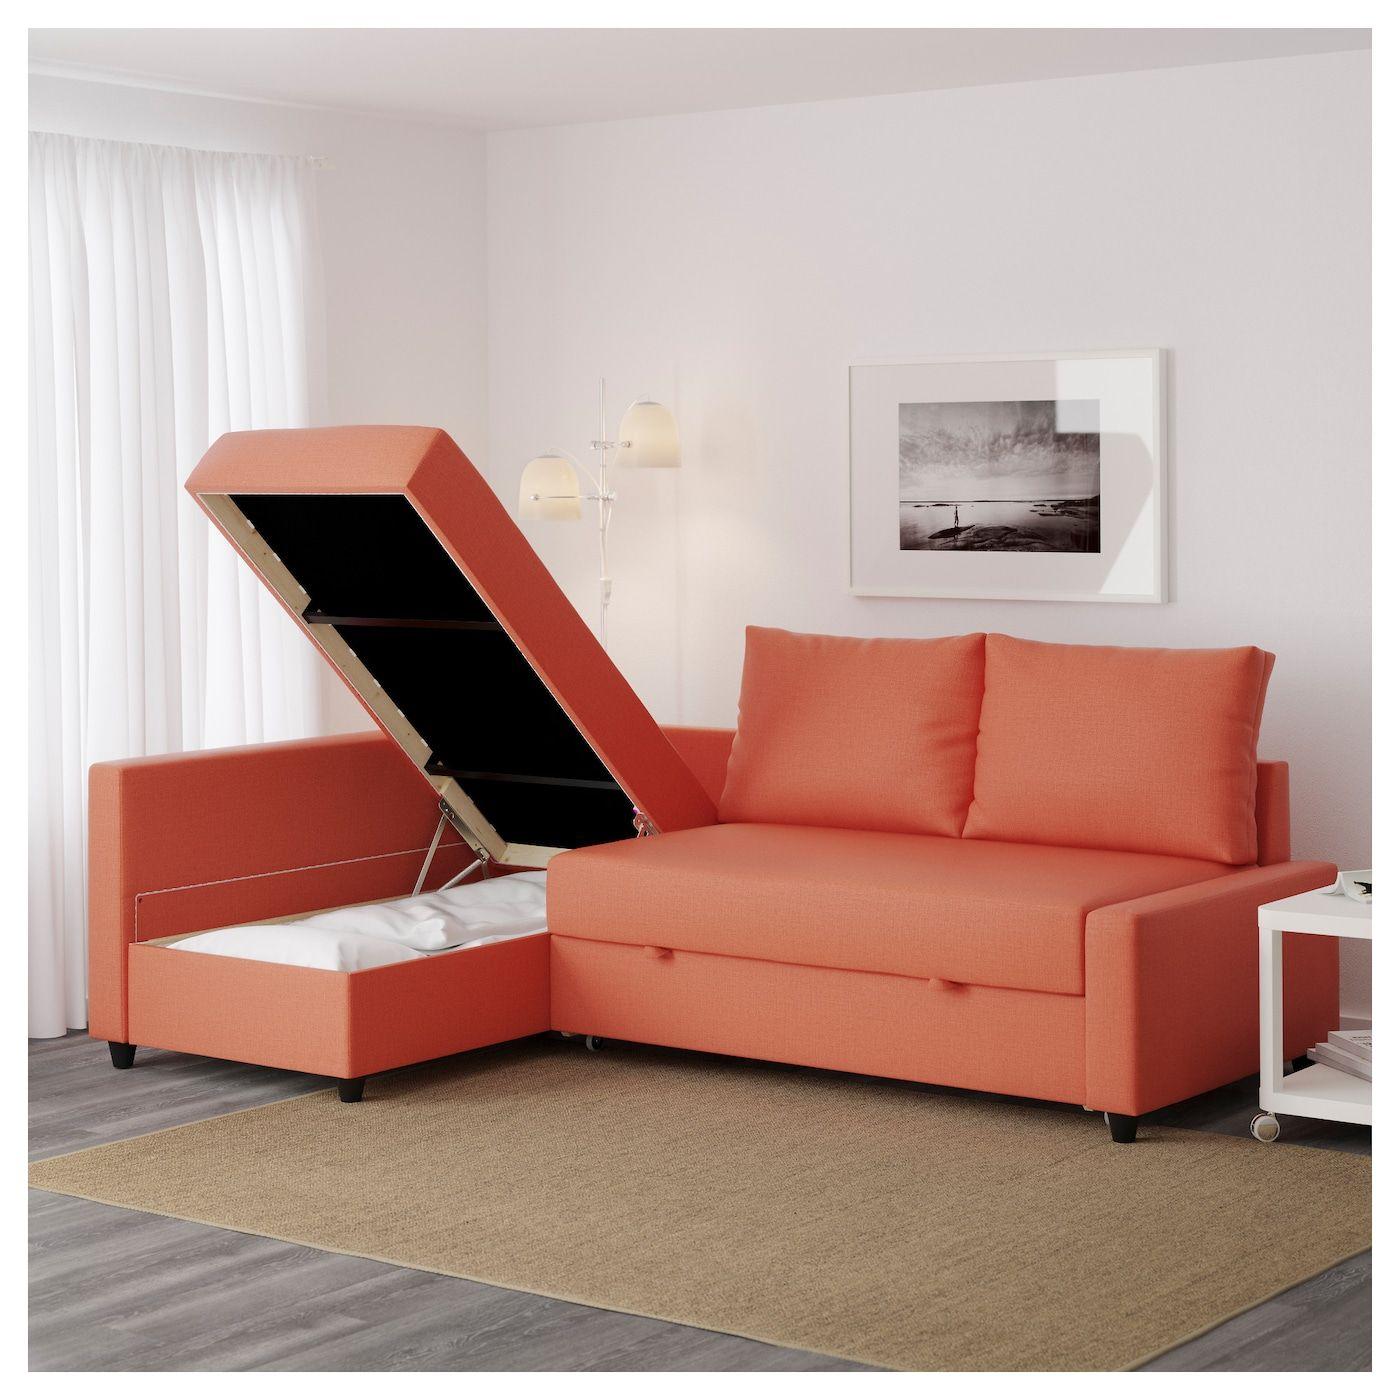 Us Furniture And Home Furnishings Corner Sofa Bed With Storage Sofa Bed With Chaise Corner Sofa Bed